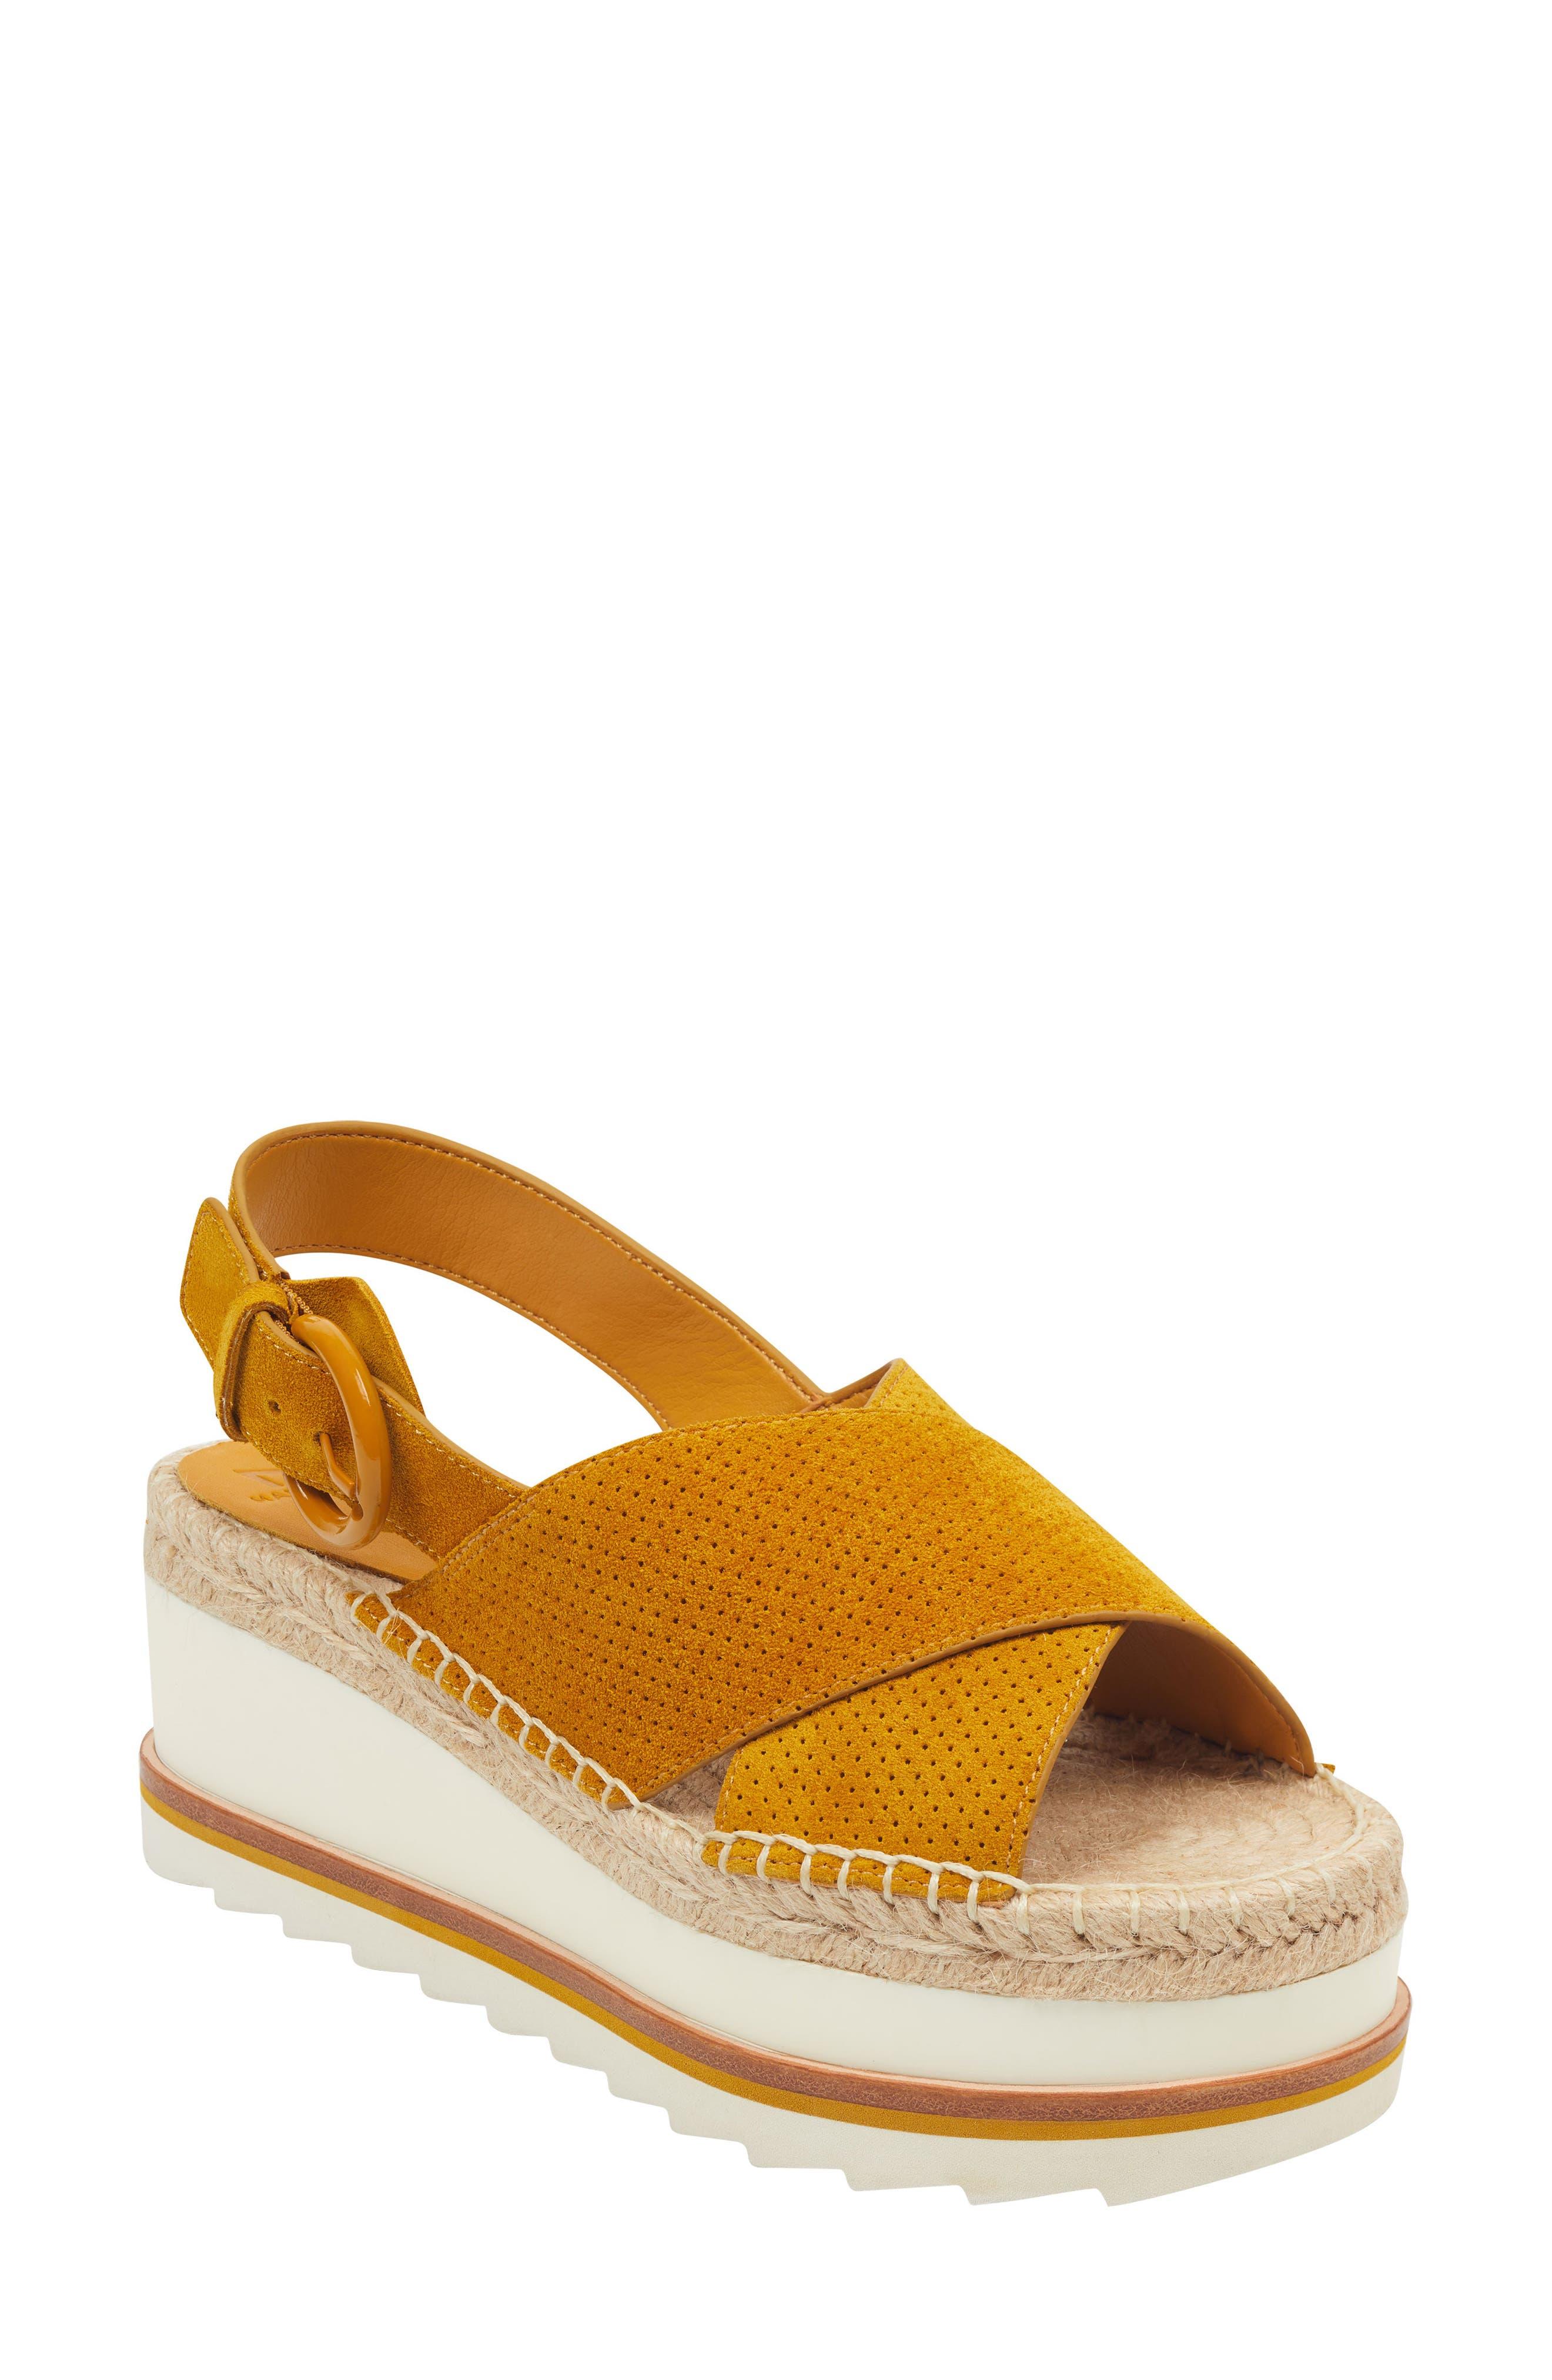 Marc Fisher Ltd Gellyn Slingback Sandal, Yellow